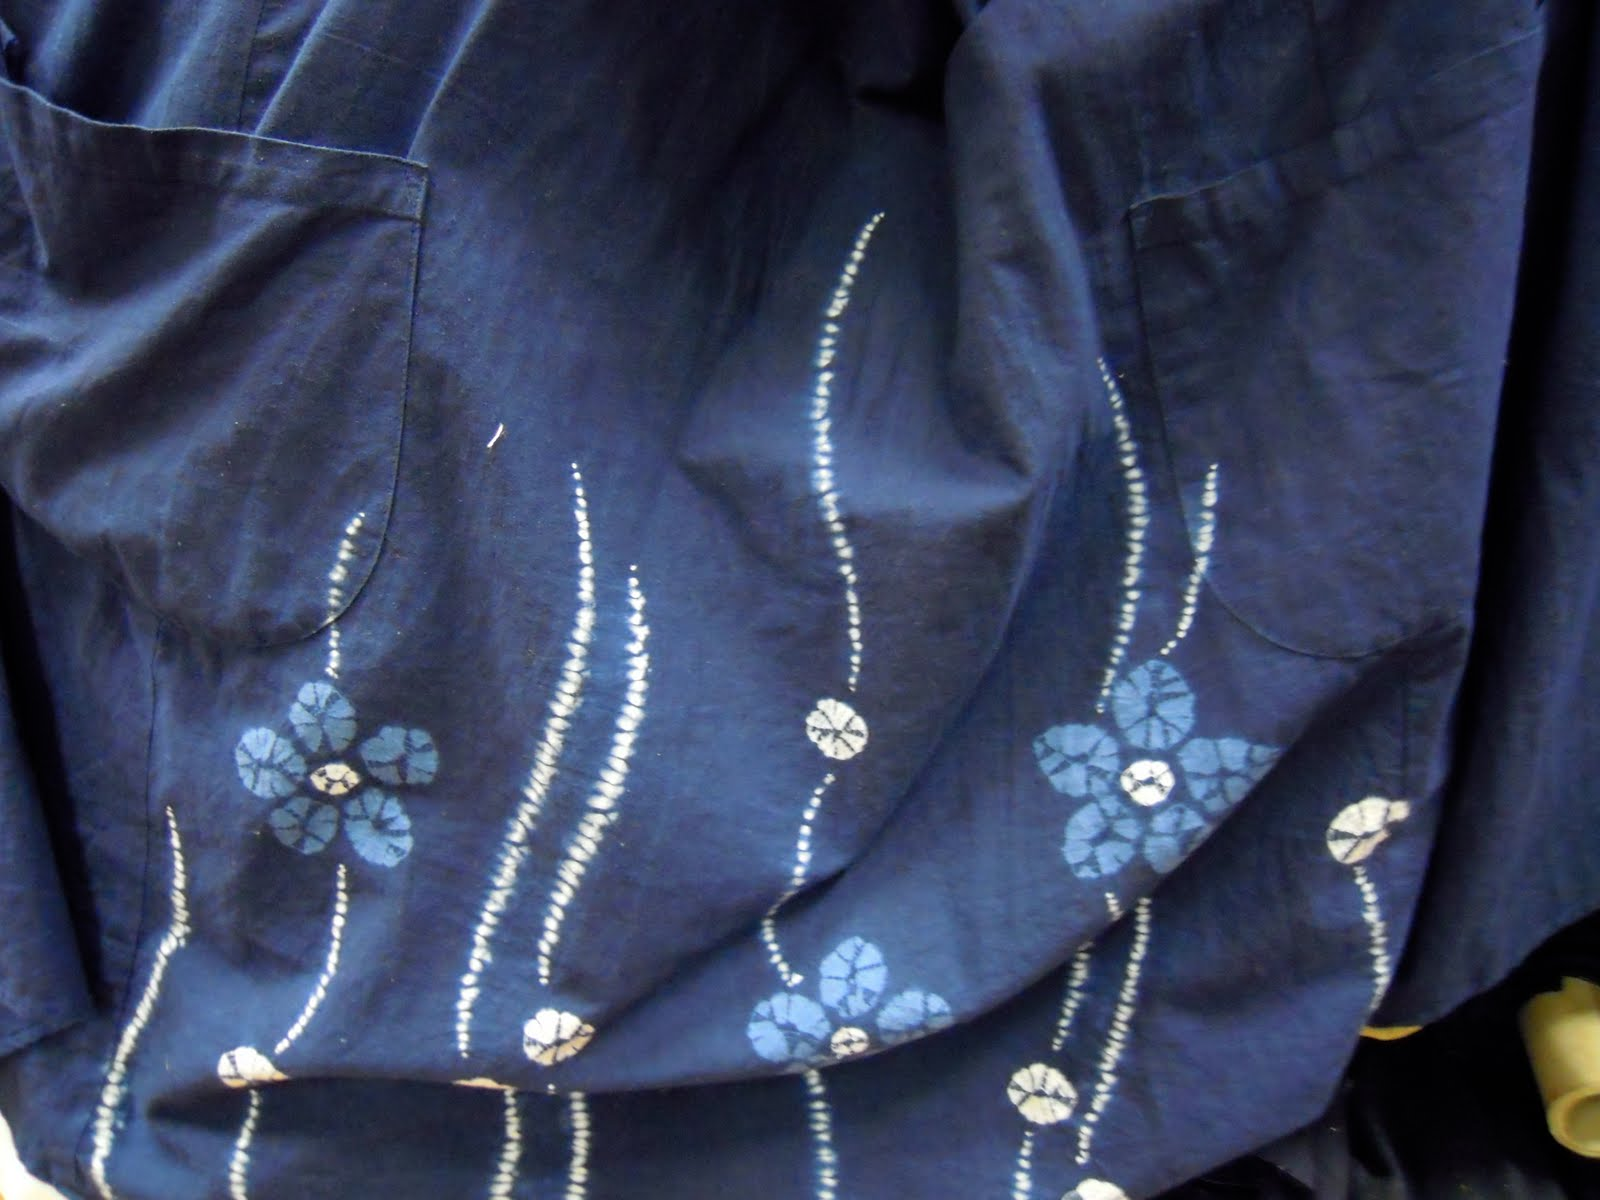 de gilles tissus une passion textile l 39 indigo tr sor. Black Bedroom Furniture Sets. Home Design Ideas